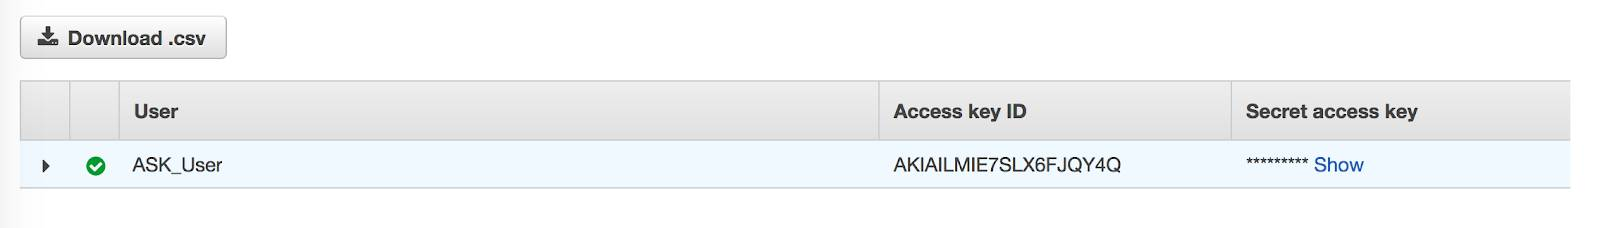 how to create an amazon alexa account in australia